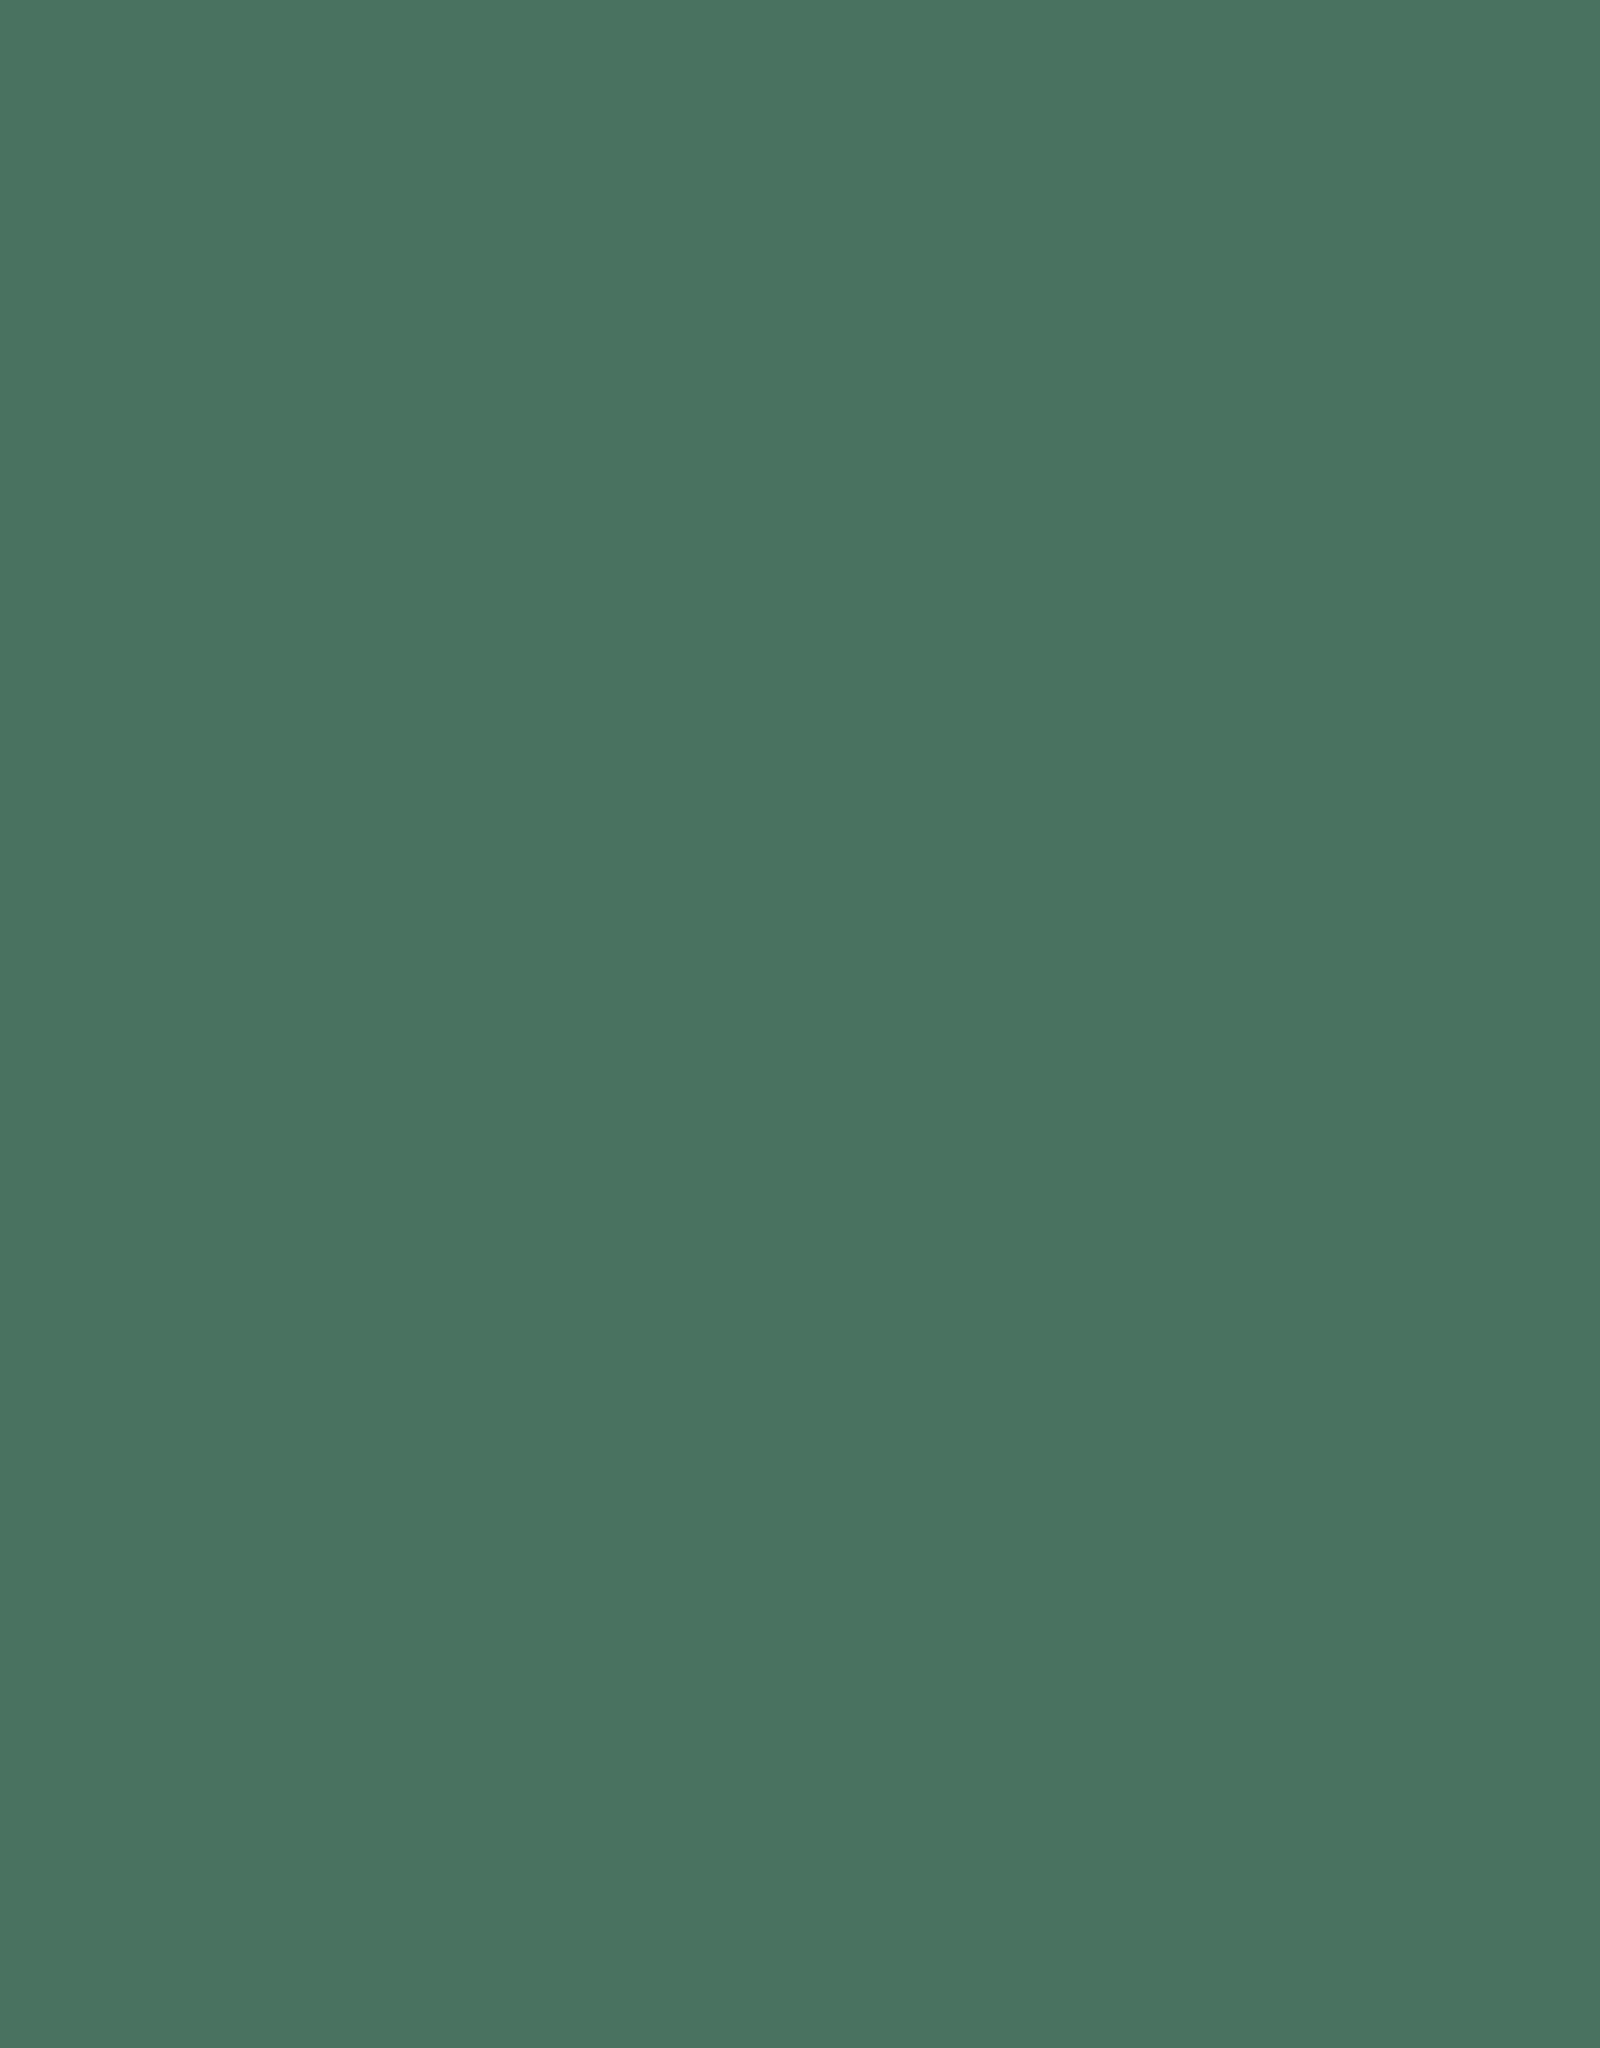 Superior Seamless Superior Seamless 4' Deep Green #12